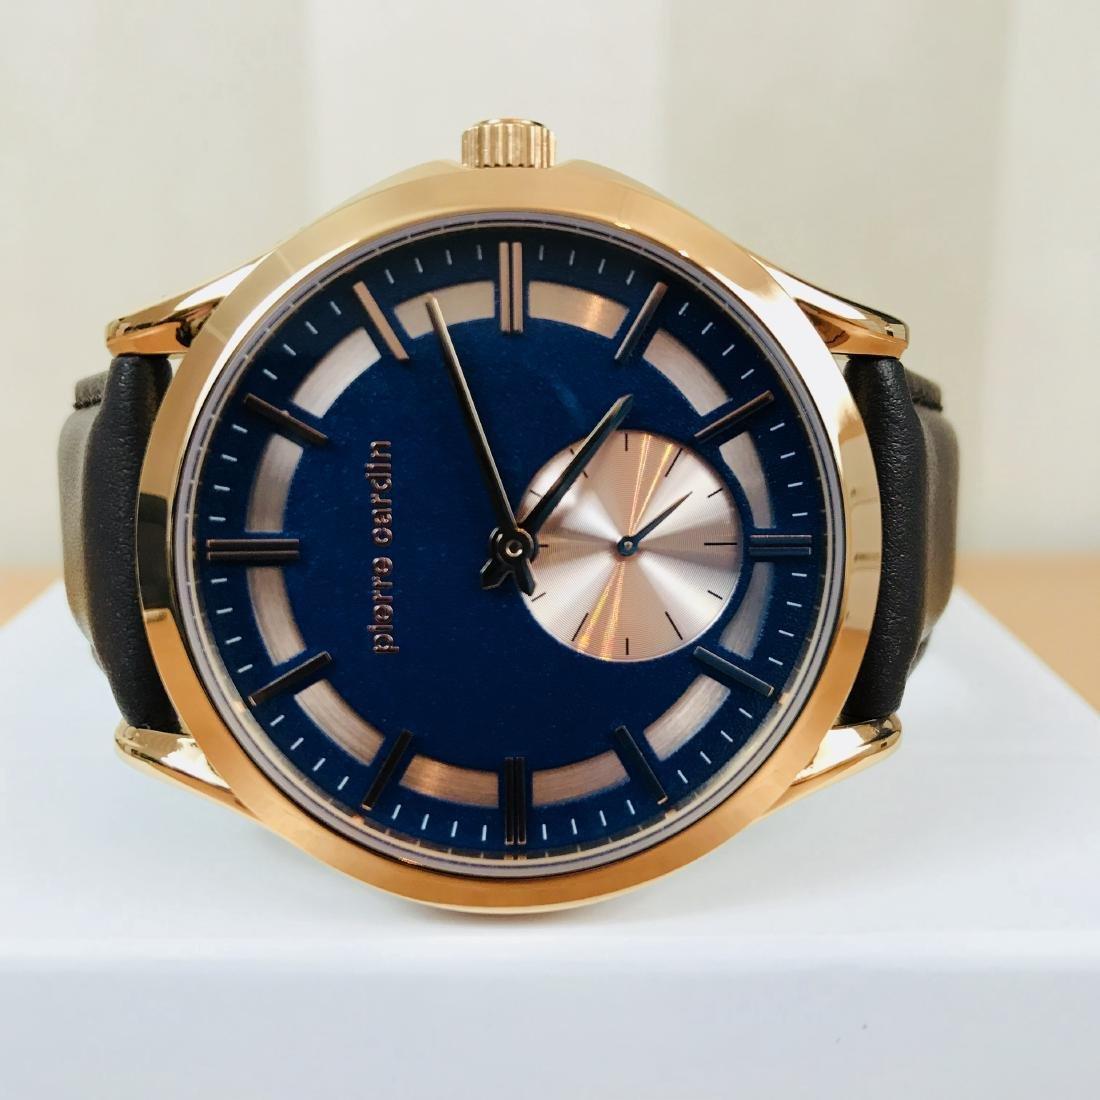 Pierre Cardin – Men's Classic Rose Gold Watch